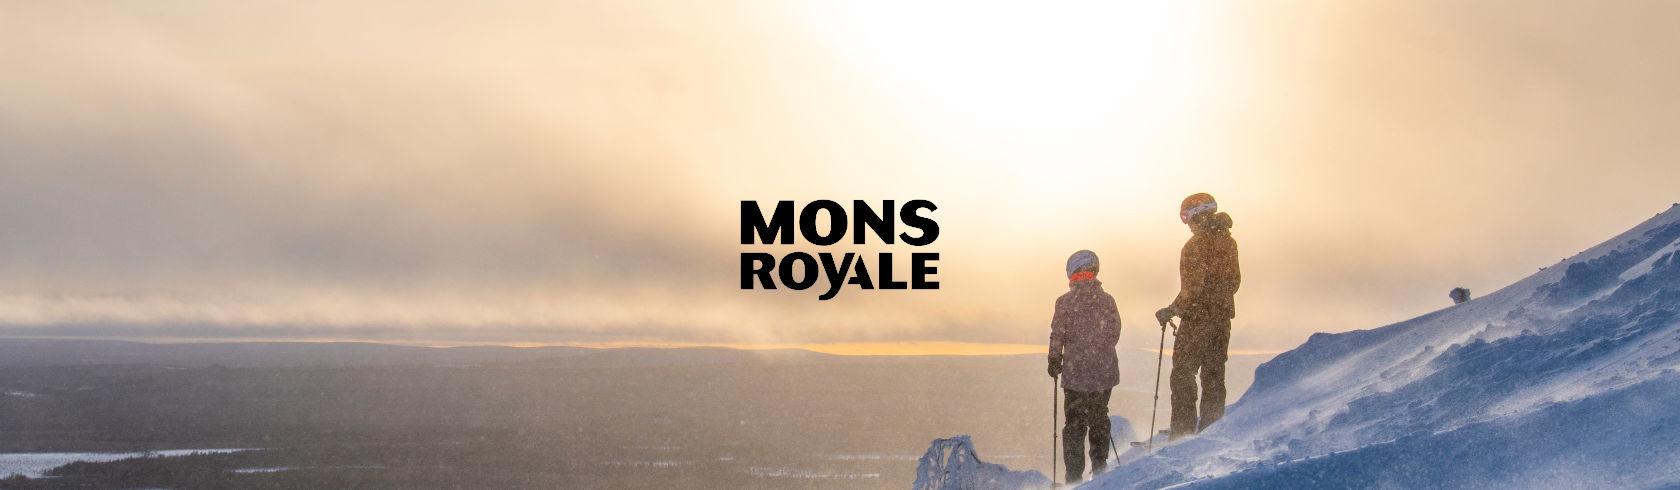 Mons Royale brand logo